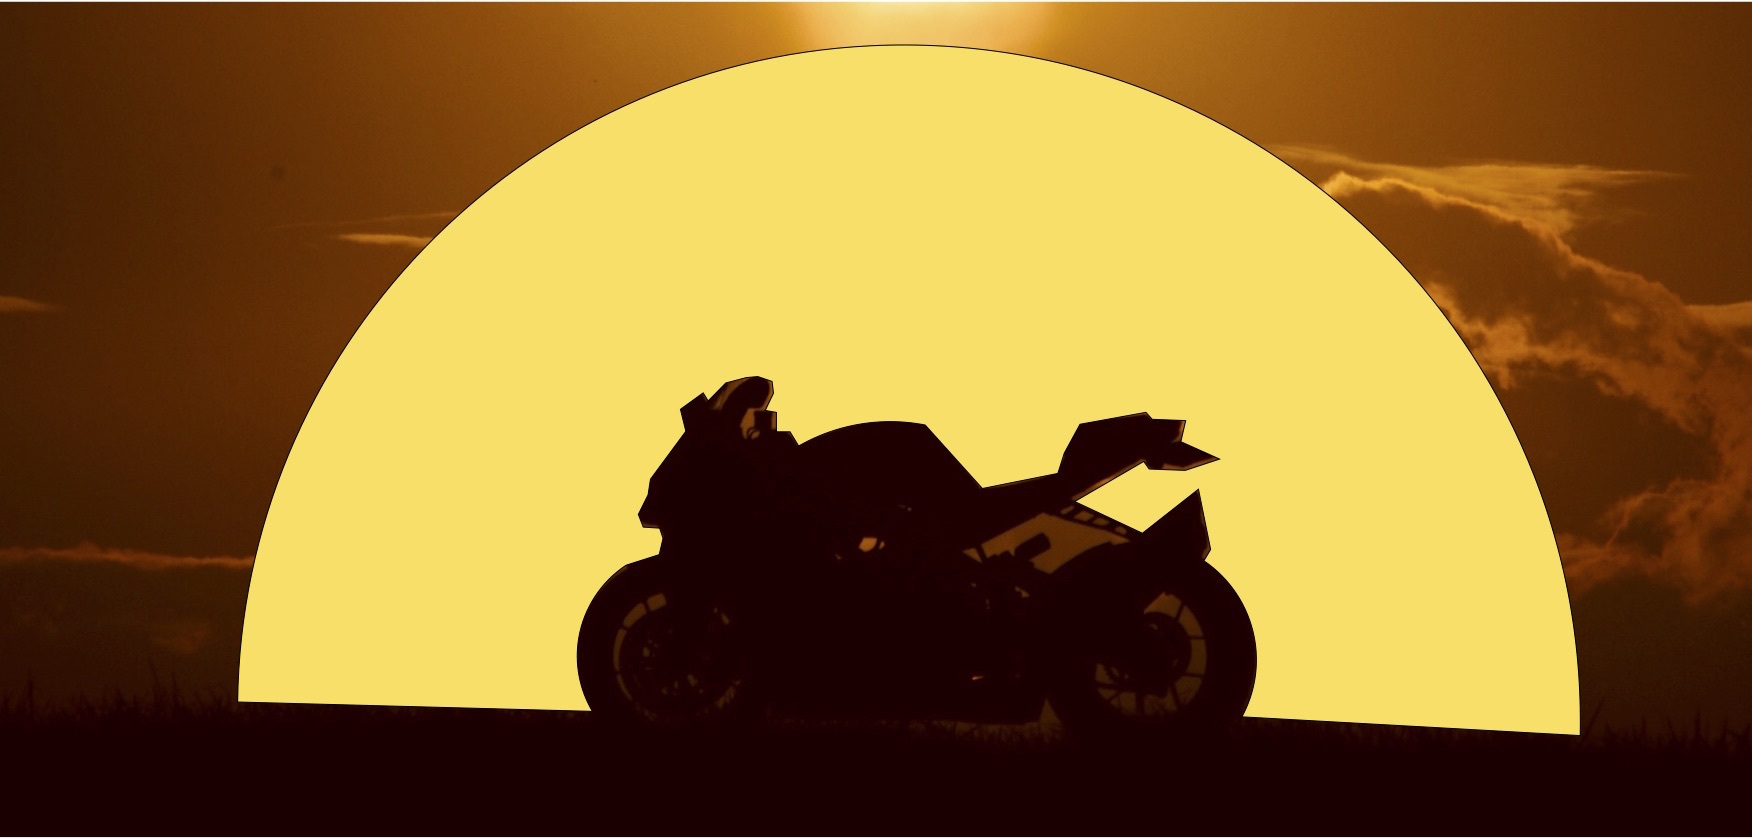 【DB7】Rising Sunの種明かし_e0159646_04190540.jpg